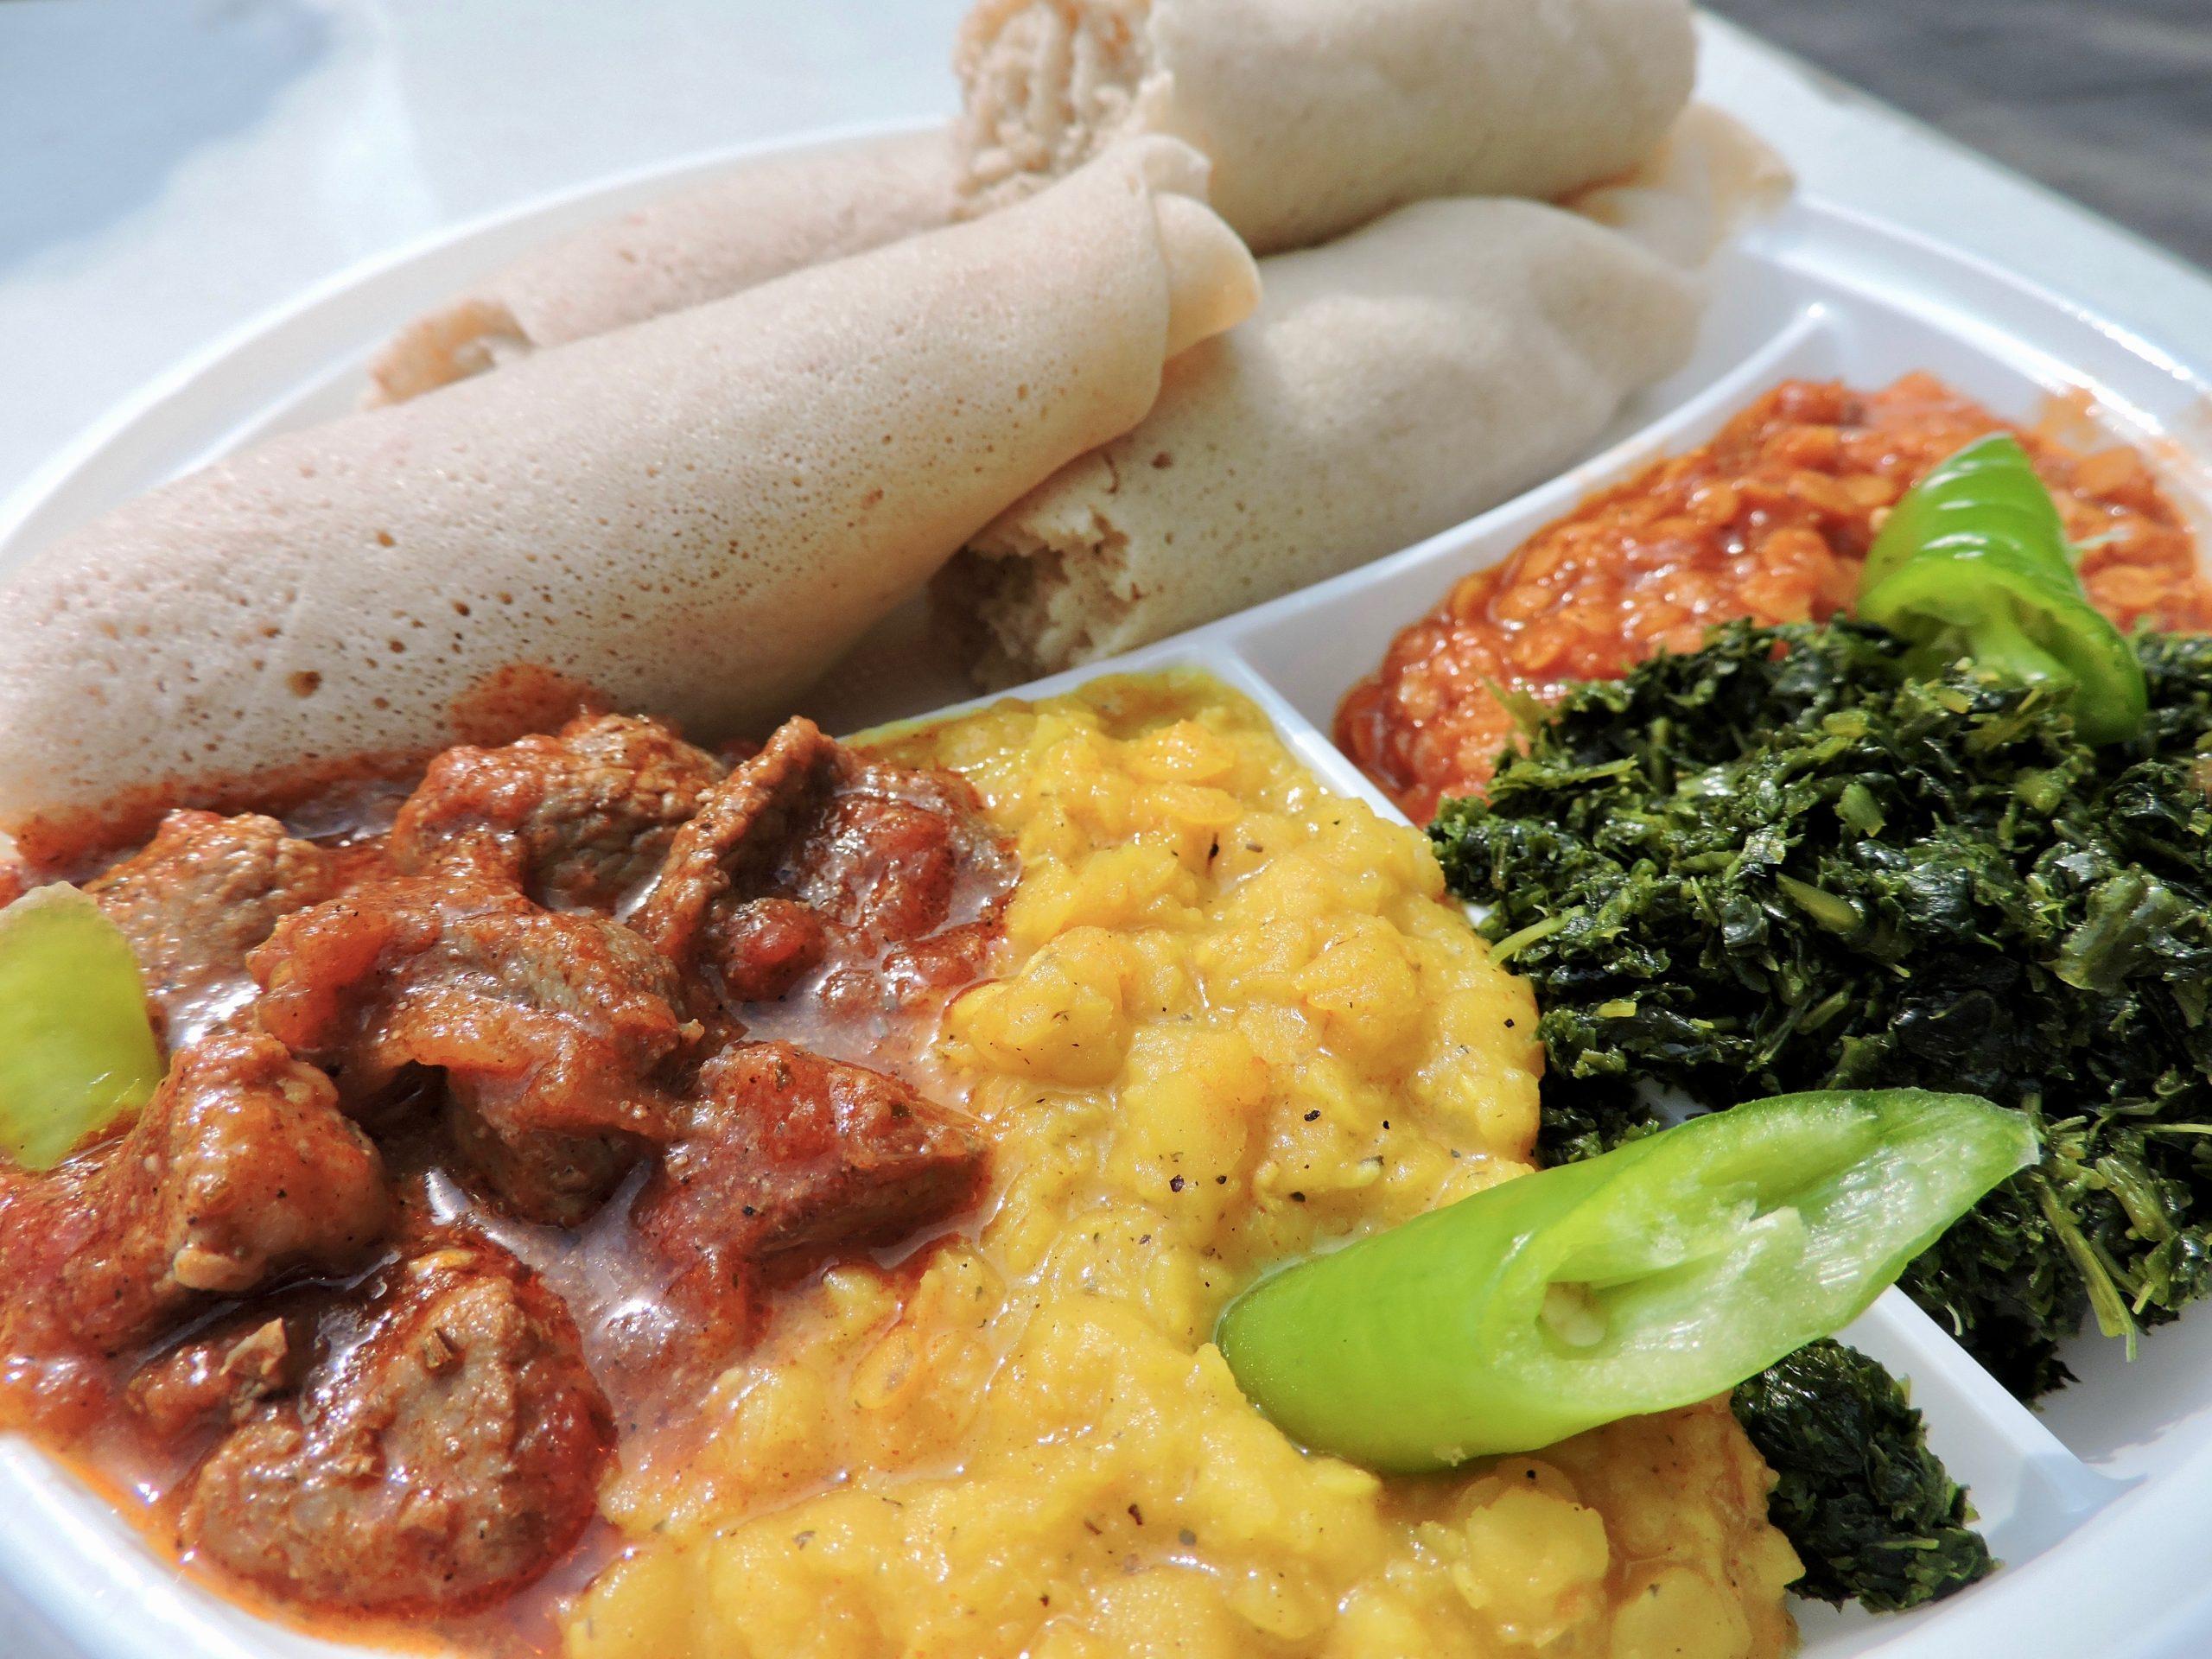 ethiopisch_markt_utrecht_mooncake